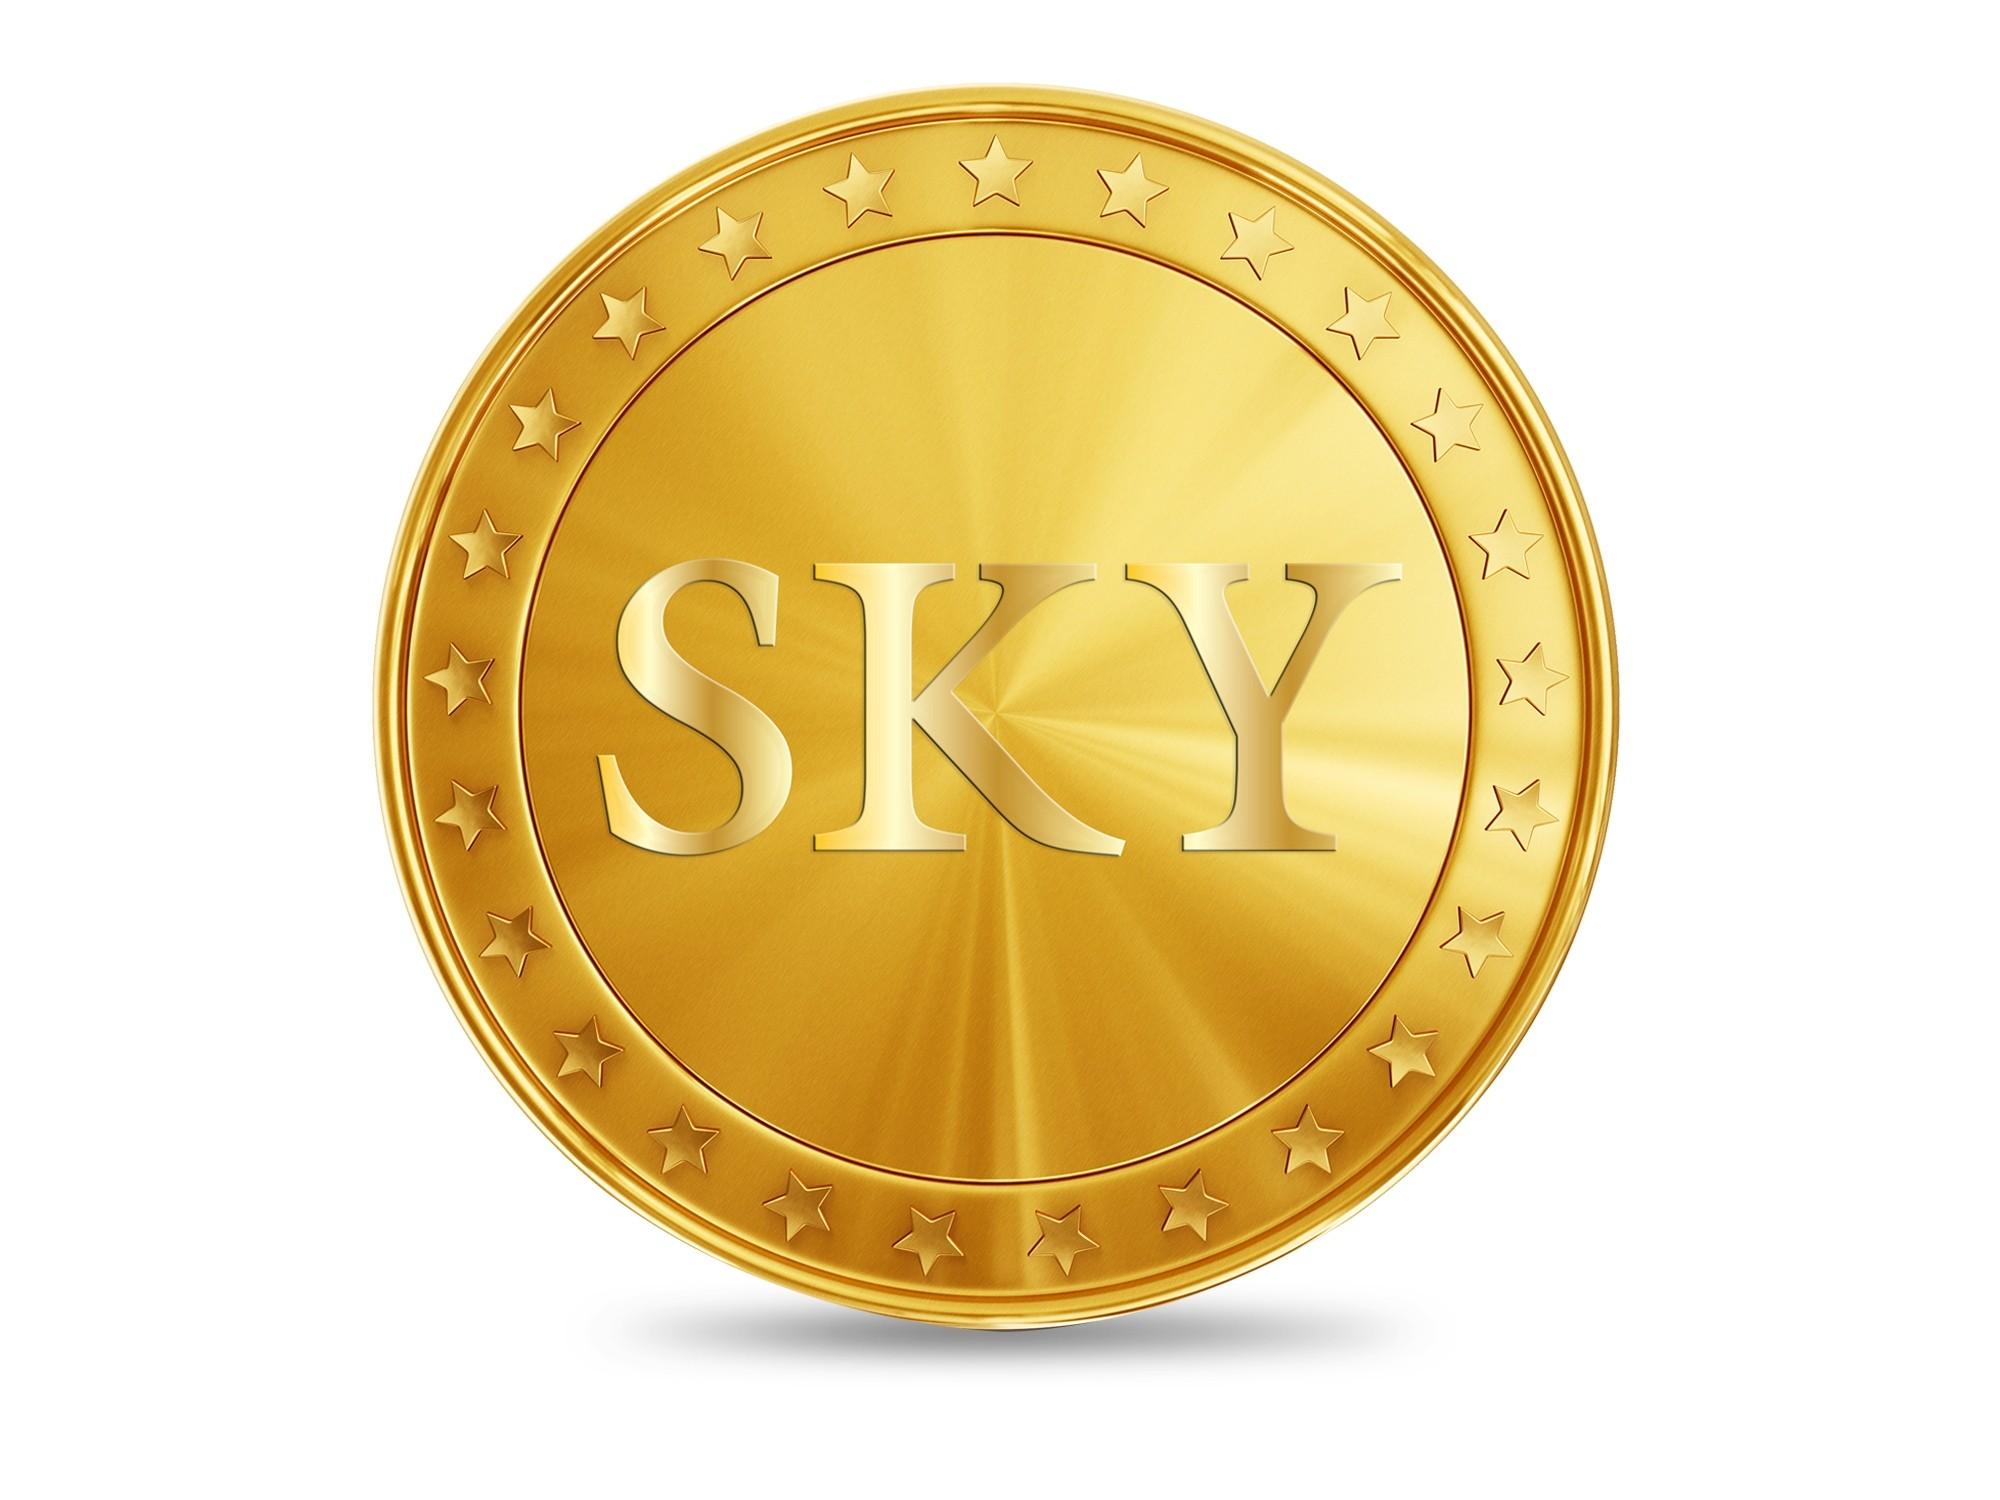 10 GRAMS GOLD COIN -24KT